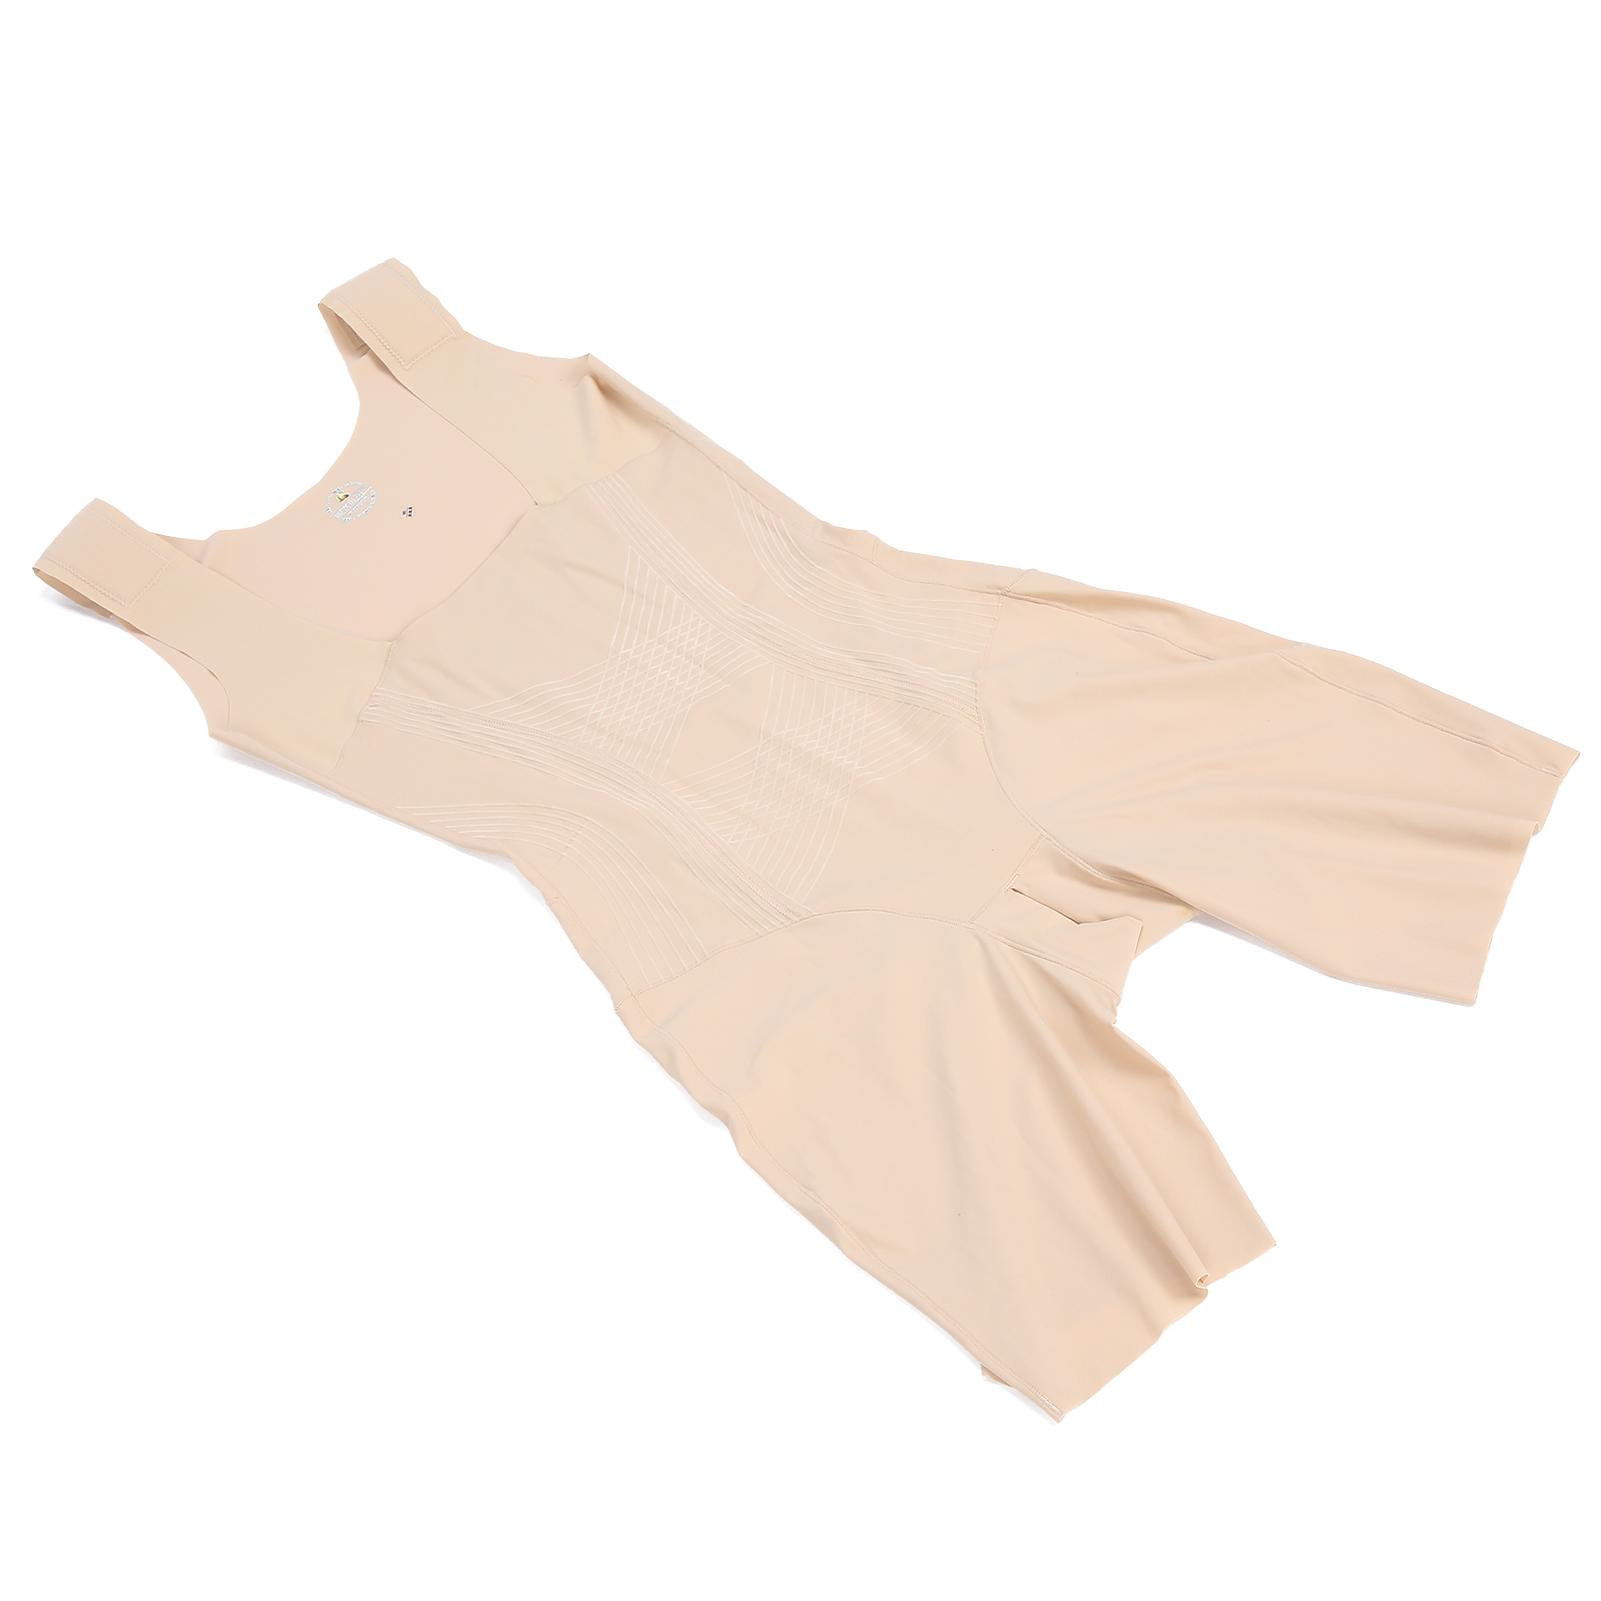 miniature 26 - Women's Full Body Taille Trainer Shaper Taille Corset underbust corset shapewear